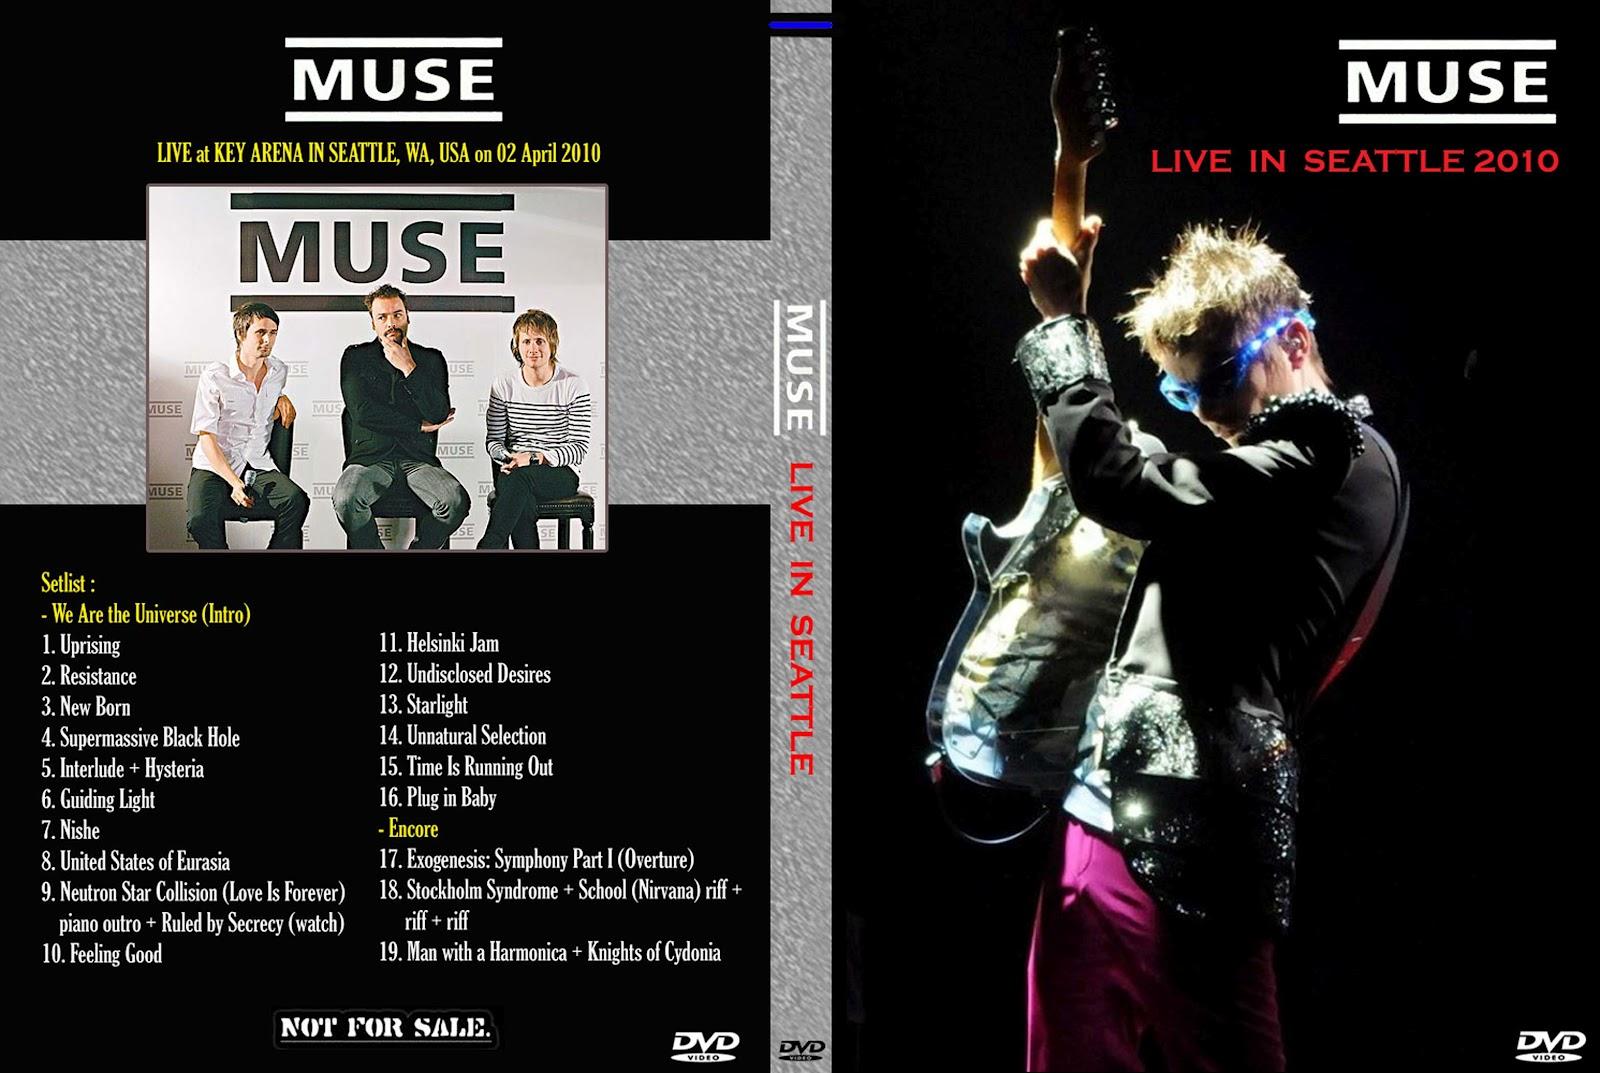 muse live at mtv: